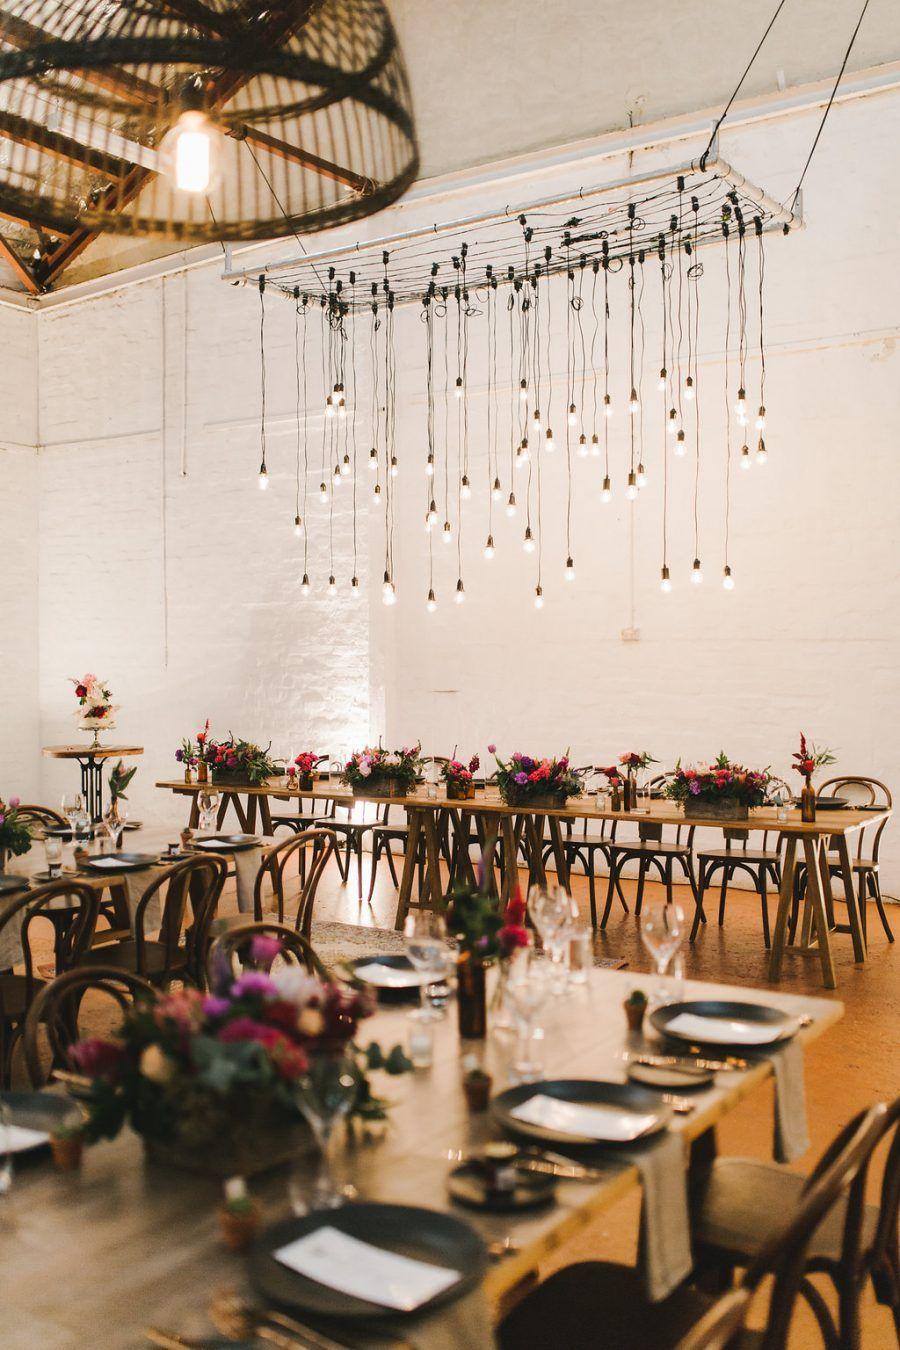 Farm wedding decor ideas  industrial warehouse wedding with suspended lighting installation